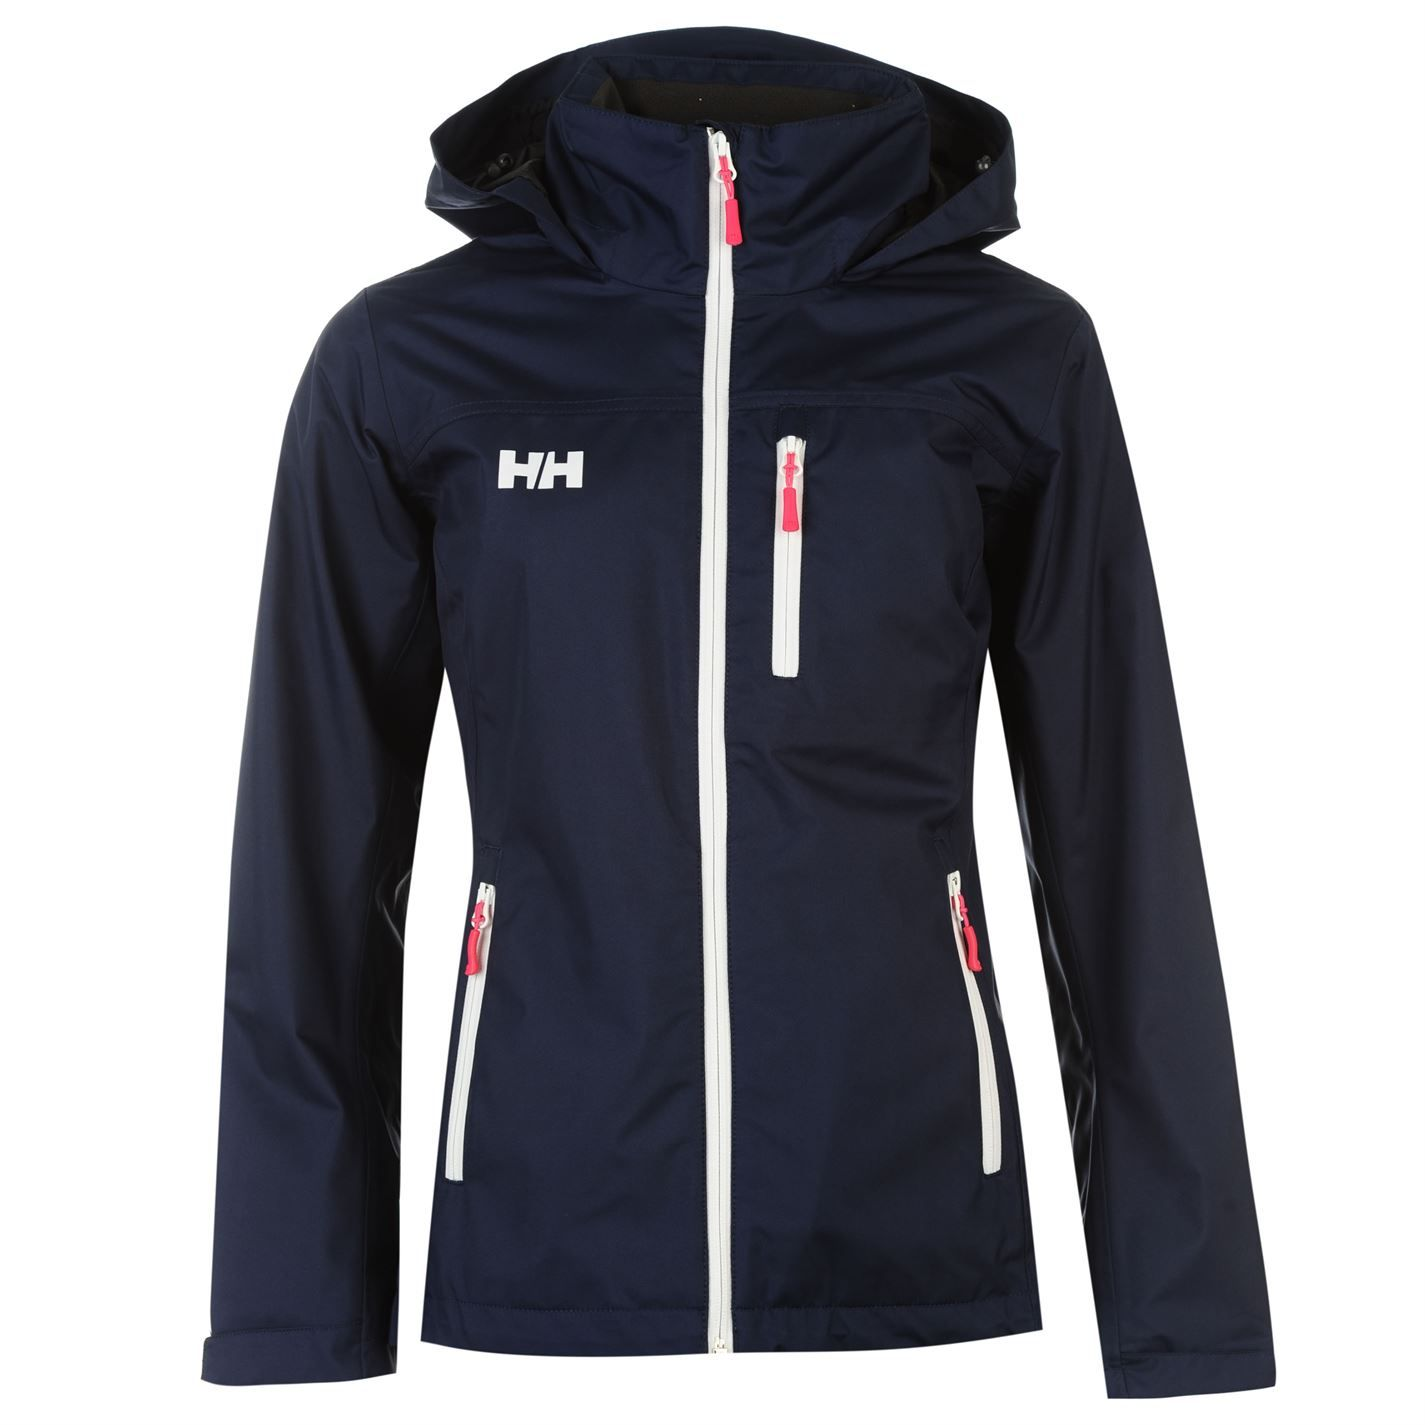 Helly Hansen | Helly Hansen Promenade Jacket Womens | Womens ...